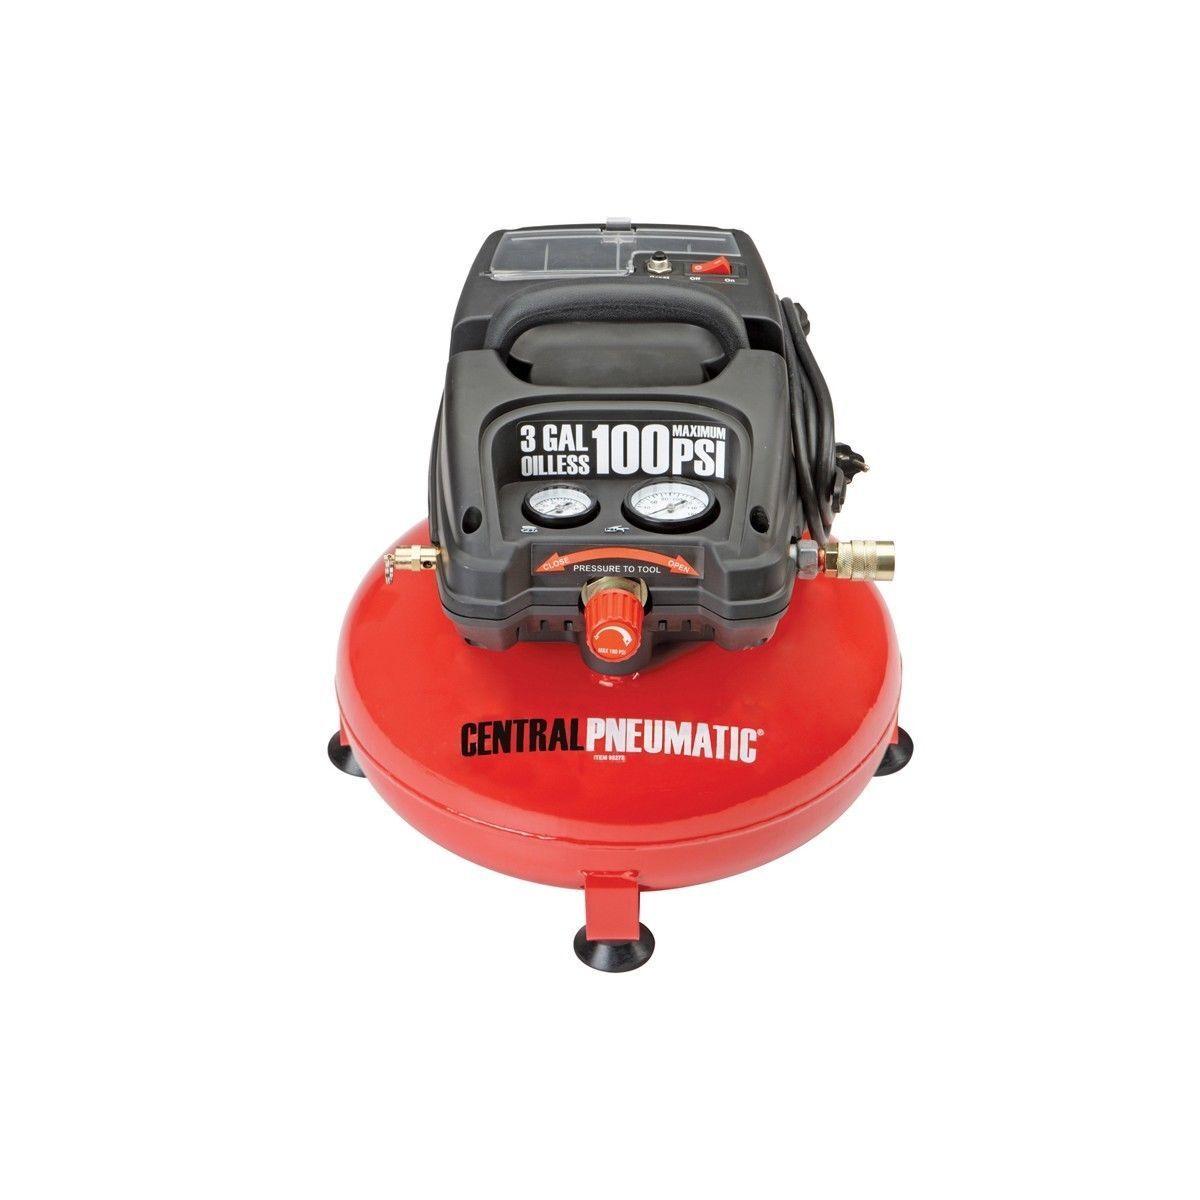 3 Gallon Air Compressor 100 PSI Oilless Portable Pancake 1 3 Horsepower Gauge